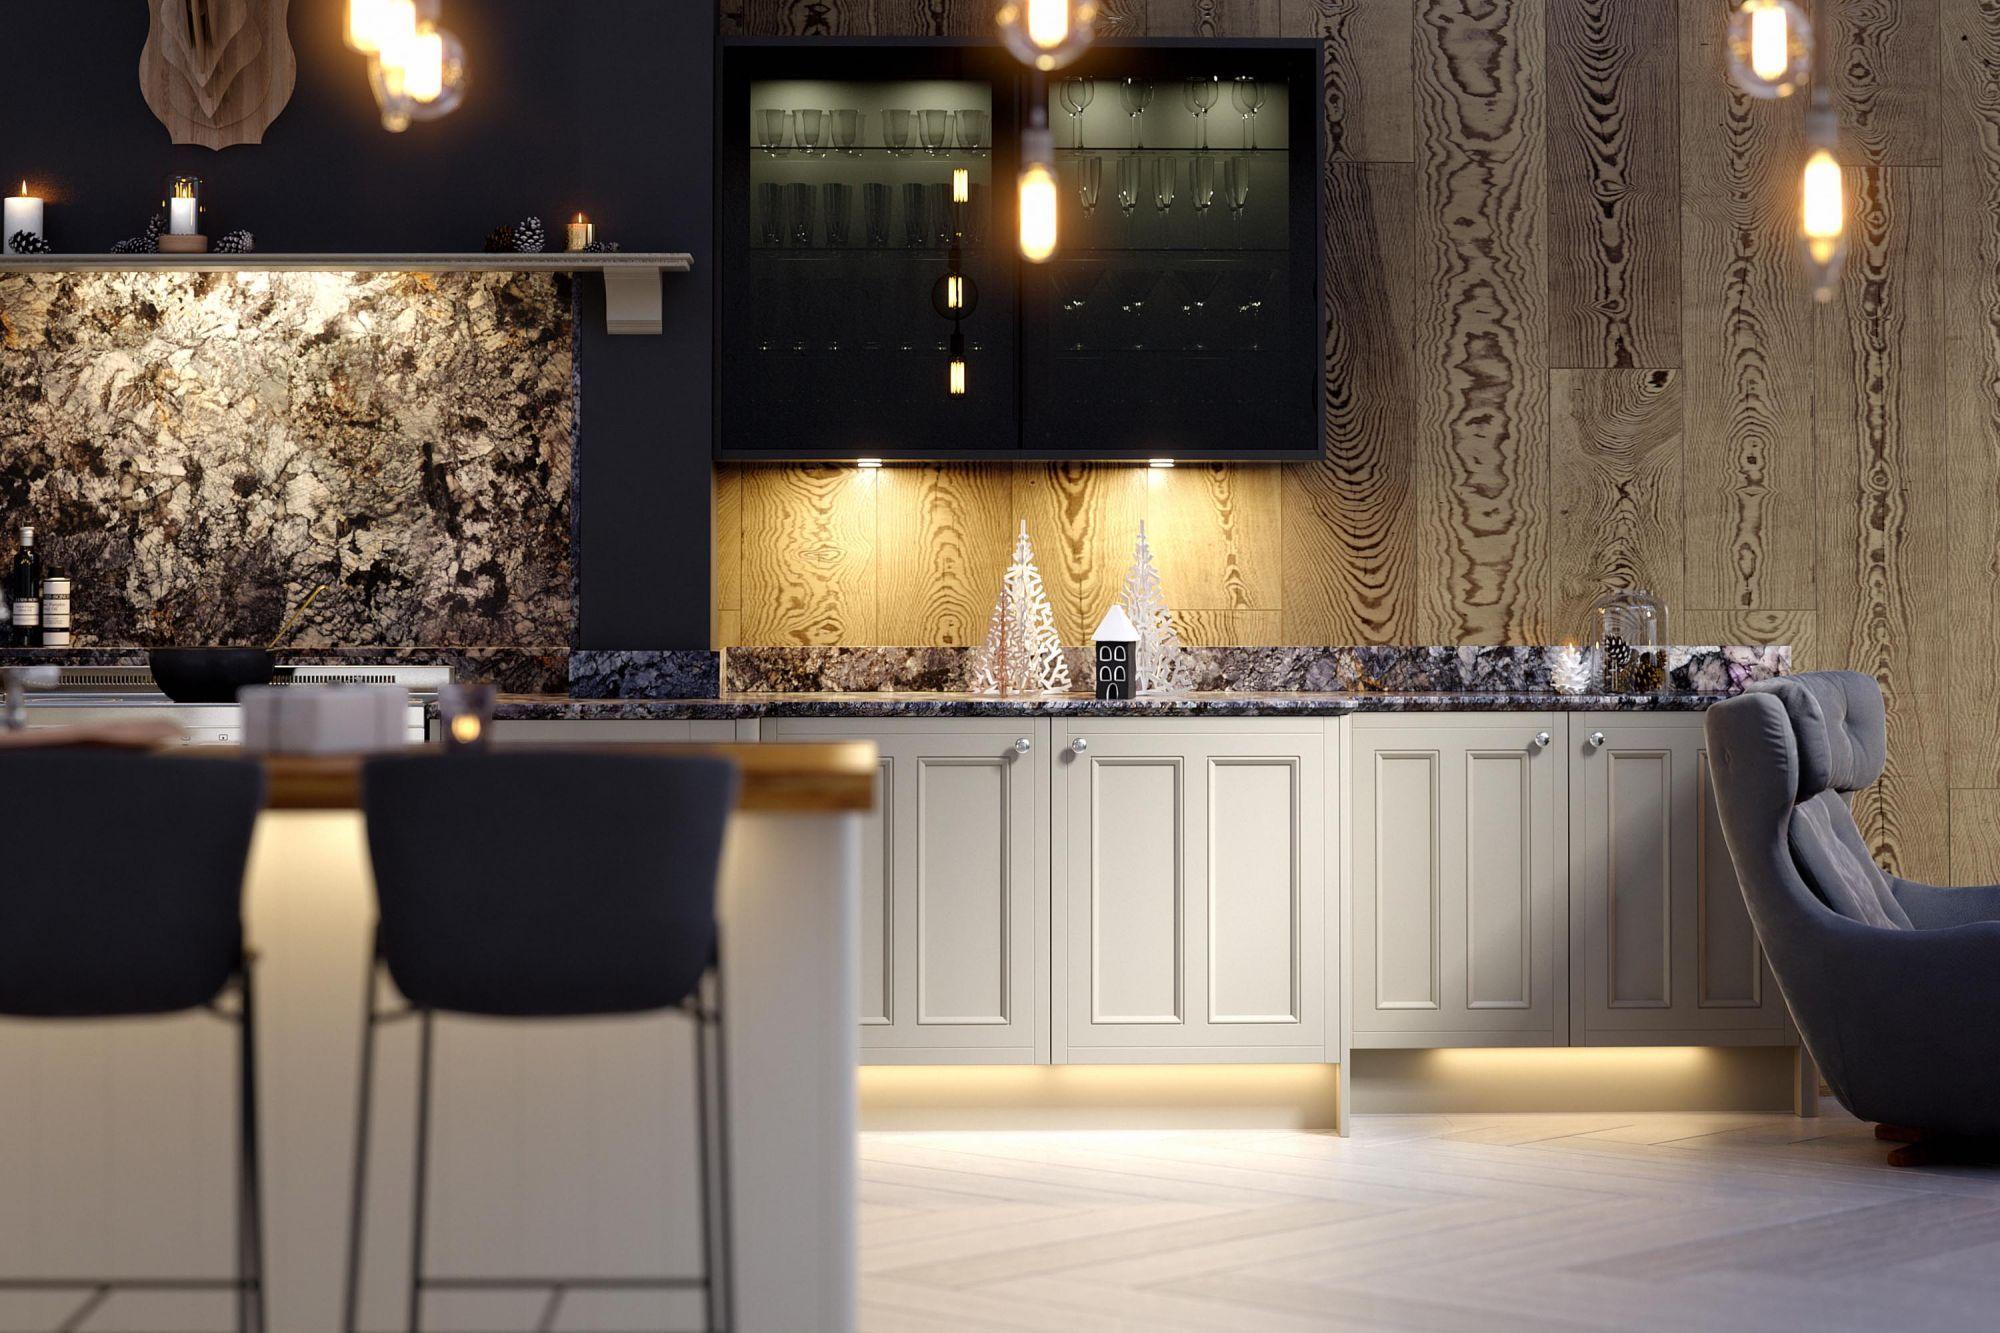 Country kitchen in nimbus and white kitchens pinterest kitchen